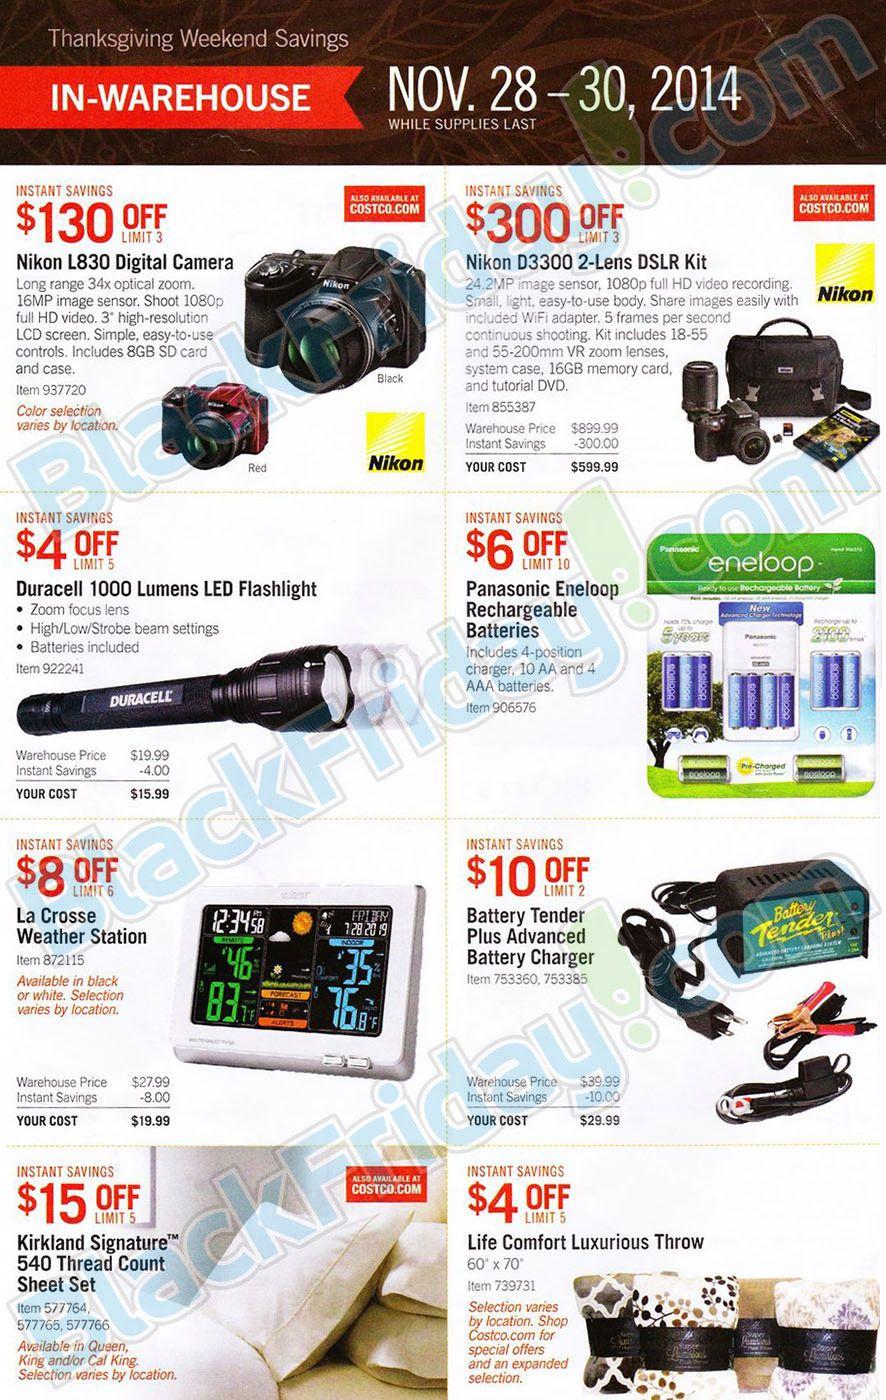 Costco Black Friday 2014 Ad Page 3 new Nikon??? | * * * Christmas ...